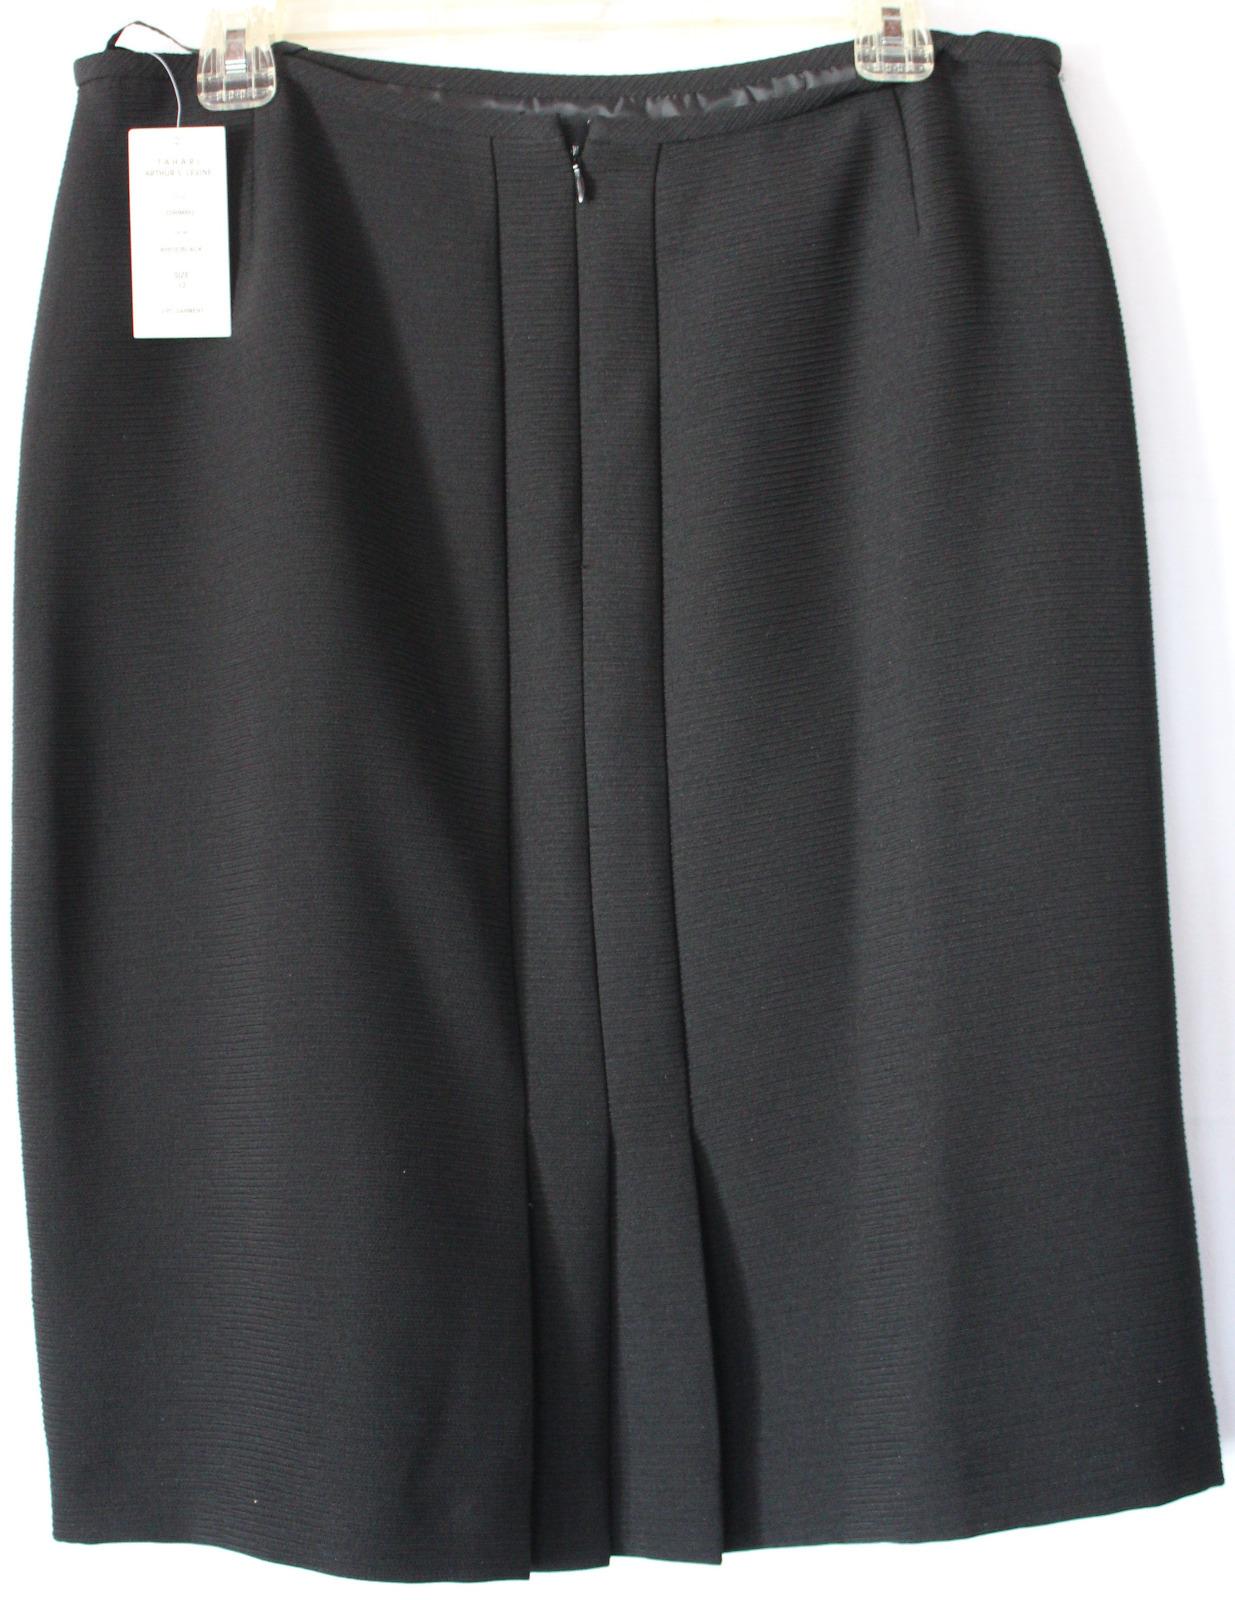 Black/White Tahari Suit (size 12)